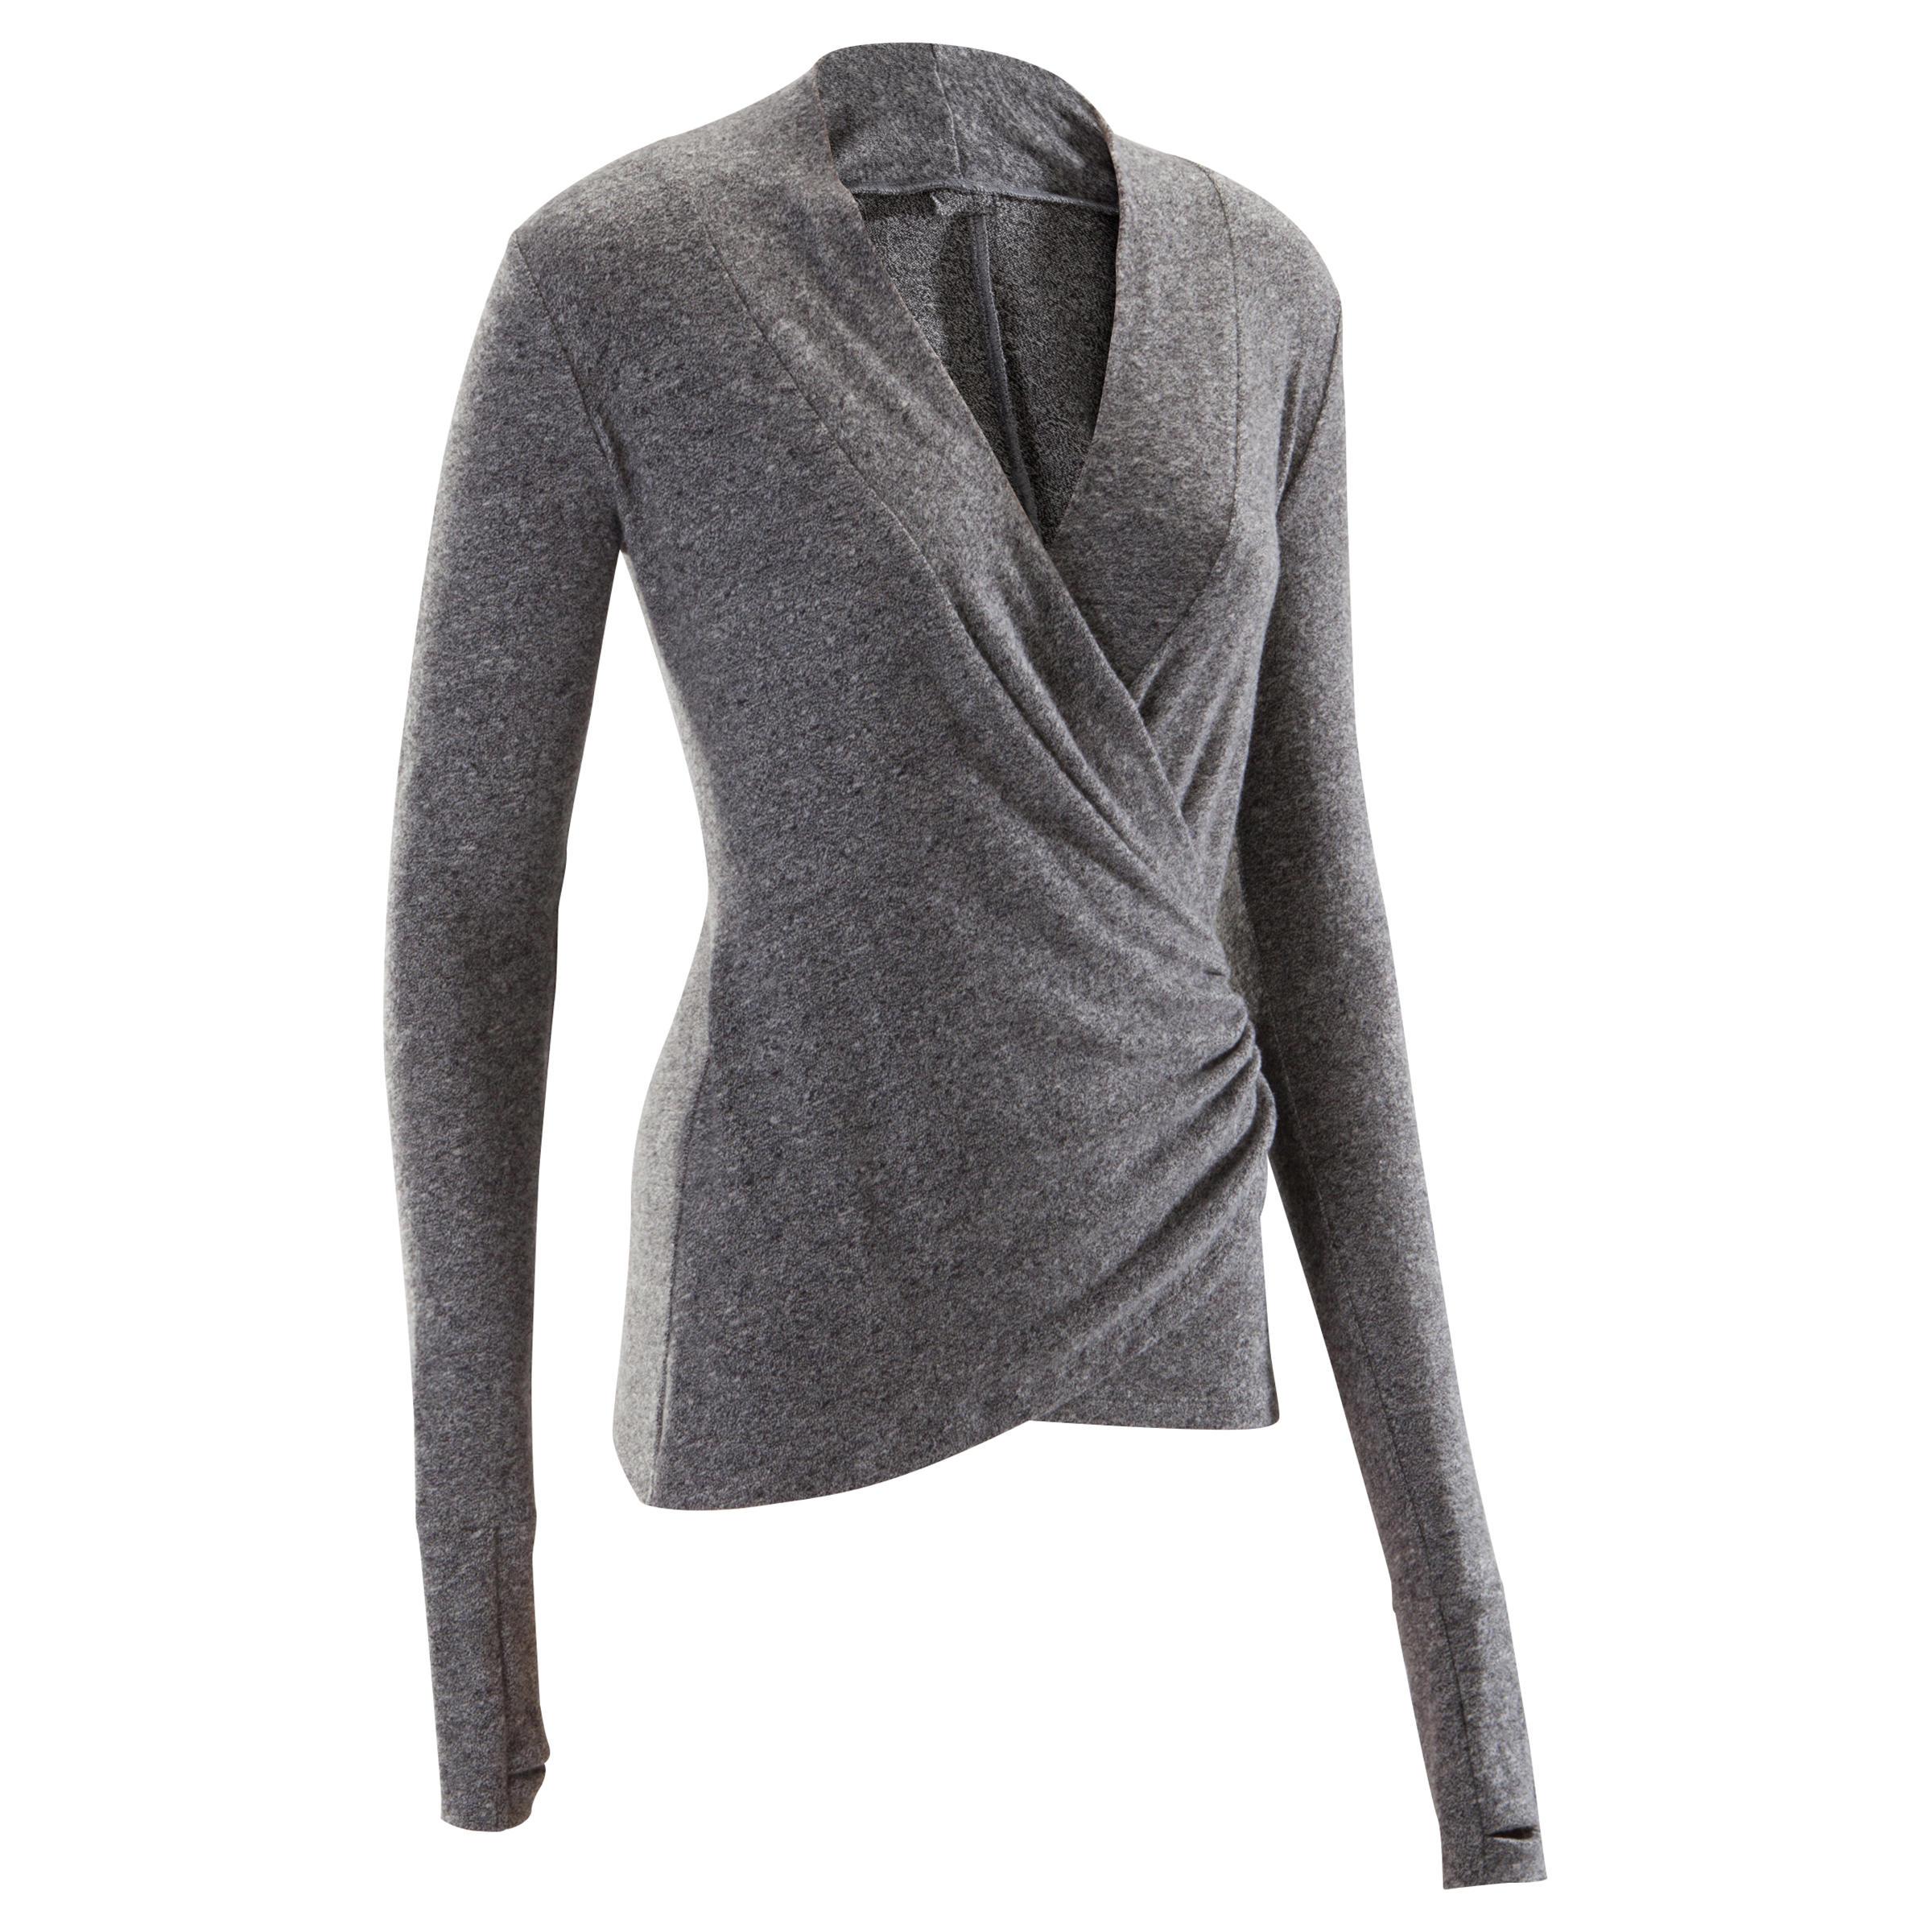 Suéter cruzado de danza clásica mujer gris moteado